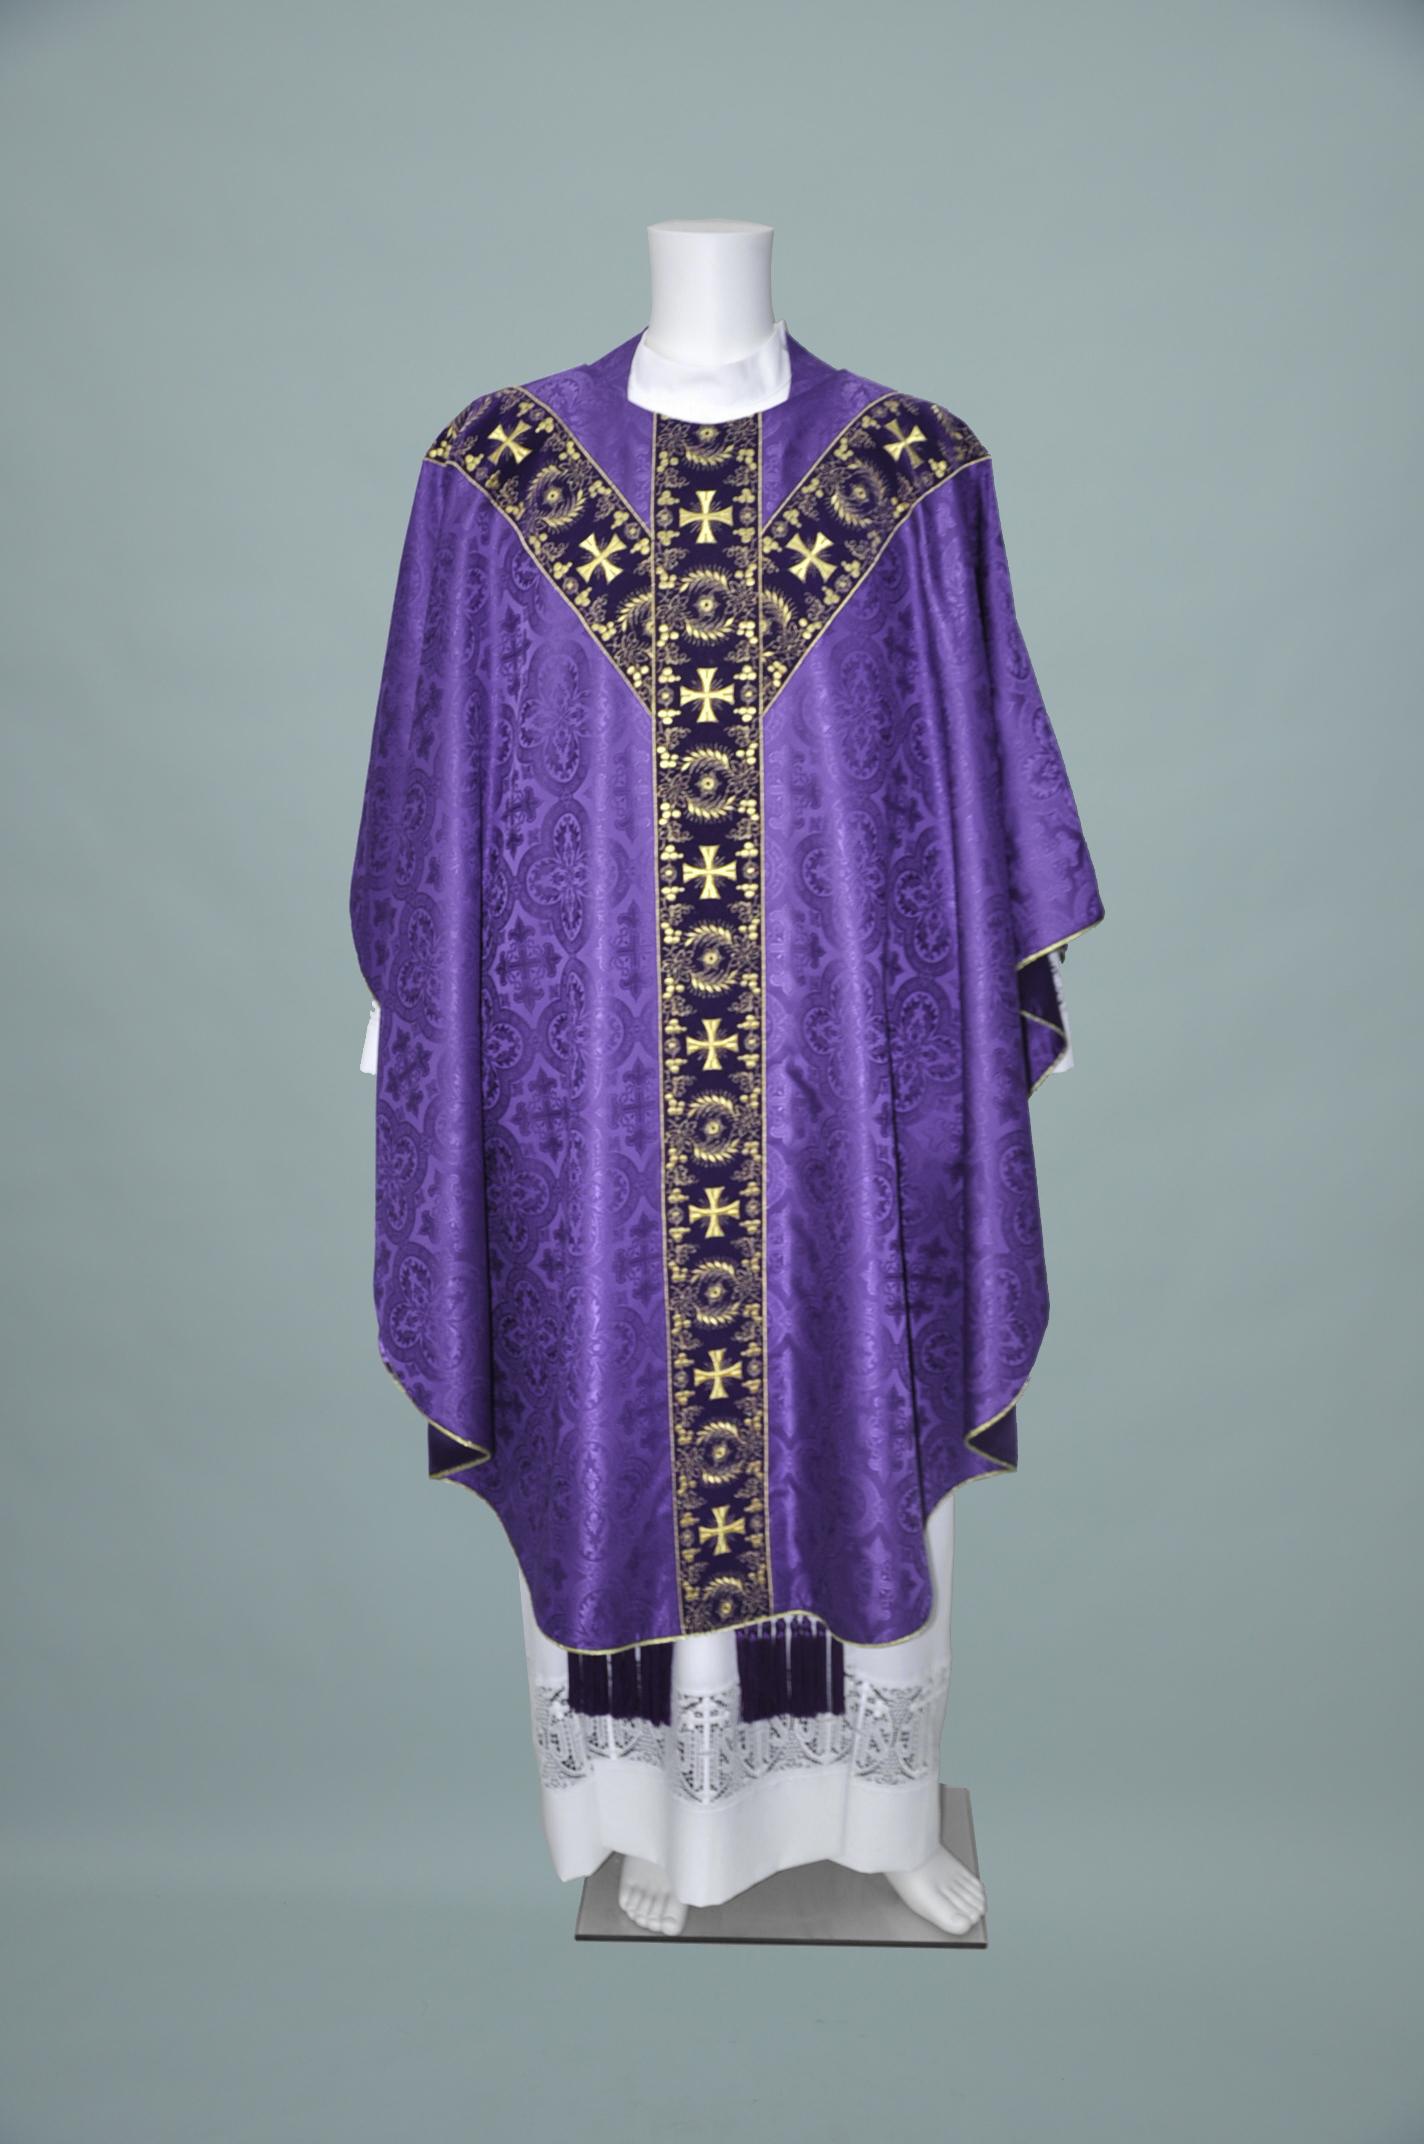 Gothic Chasuble Davinci Purple W 1706 Purple gold (f) 1.jpg